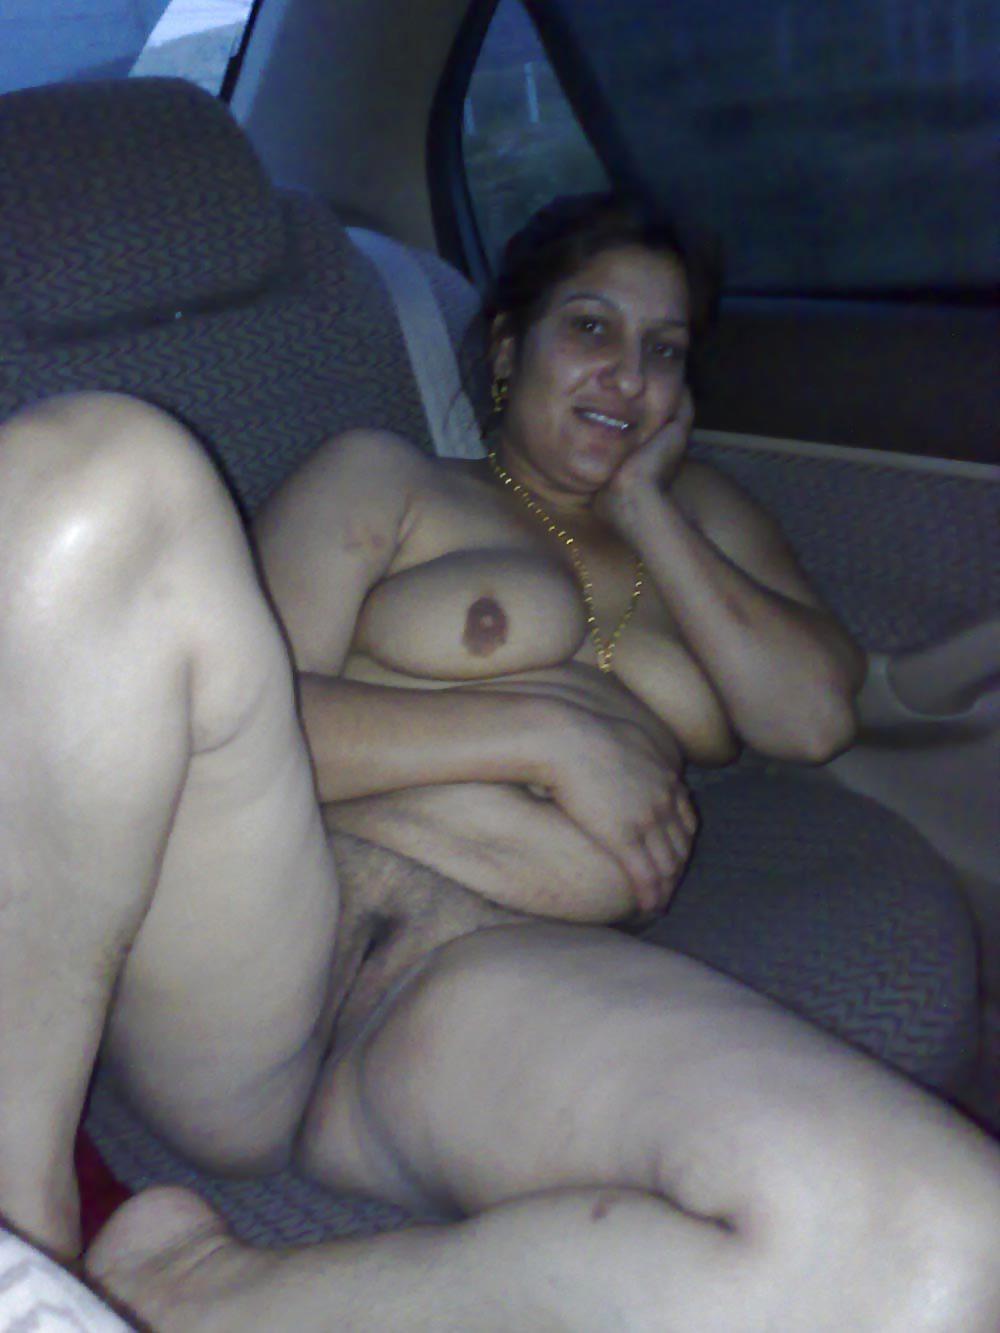 desi matured busty bhabhi showing huge boobs get pressed n choot pics